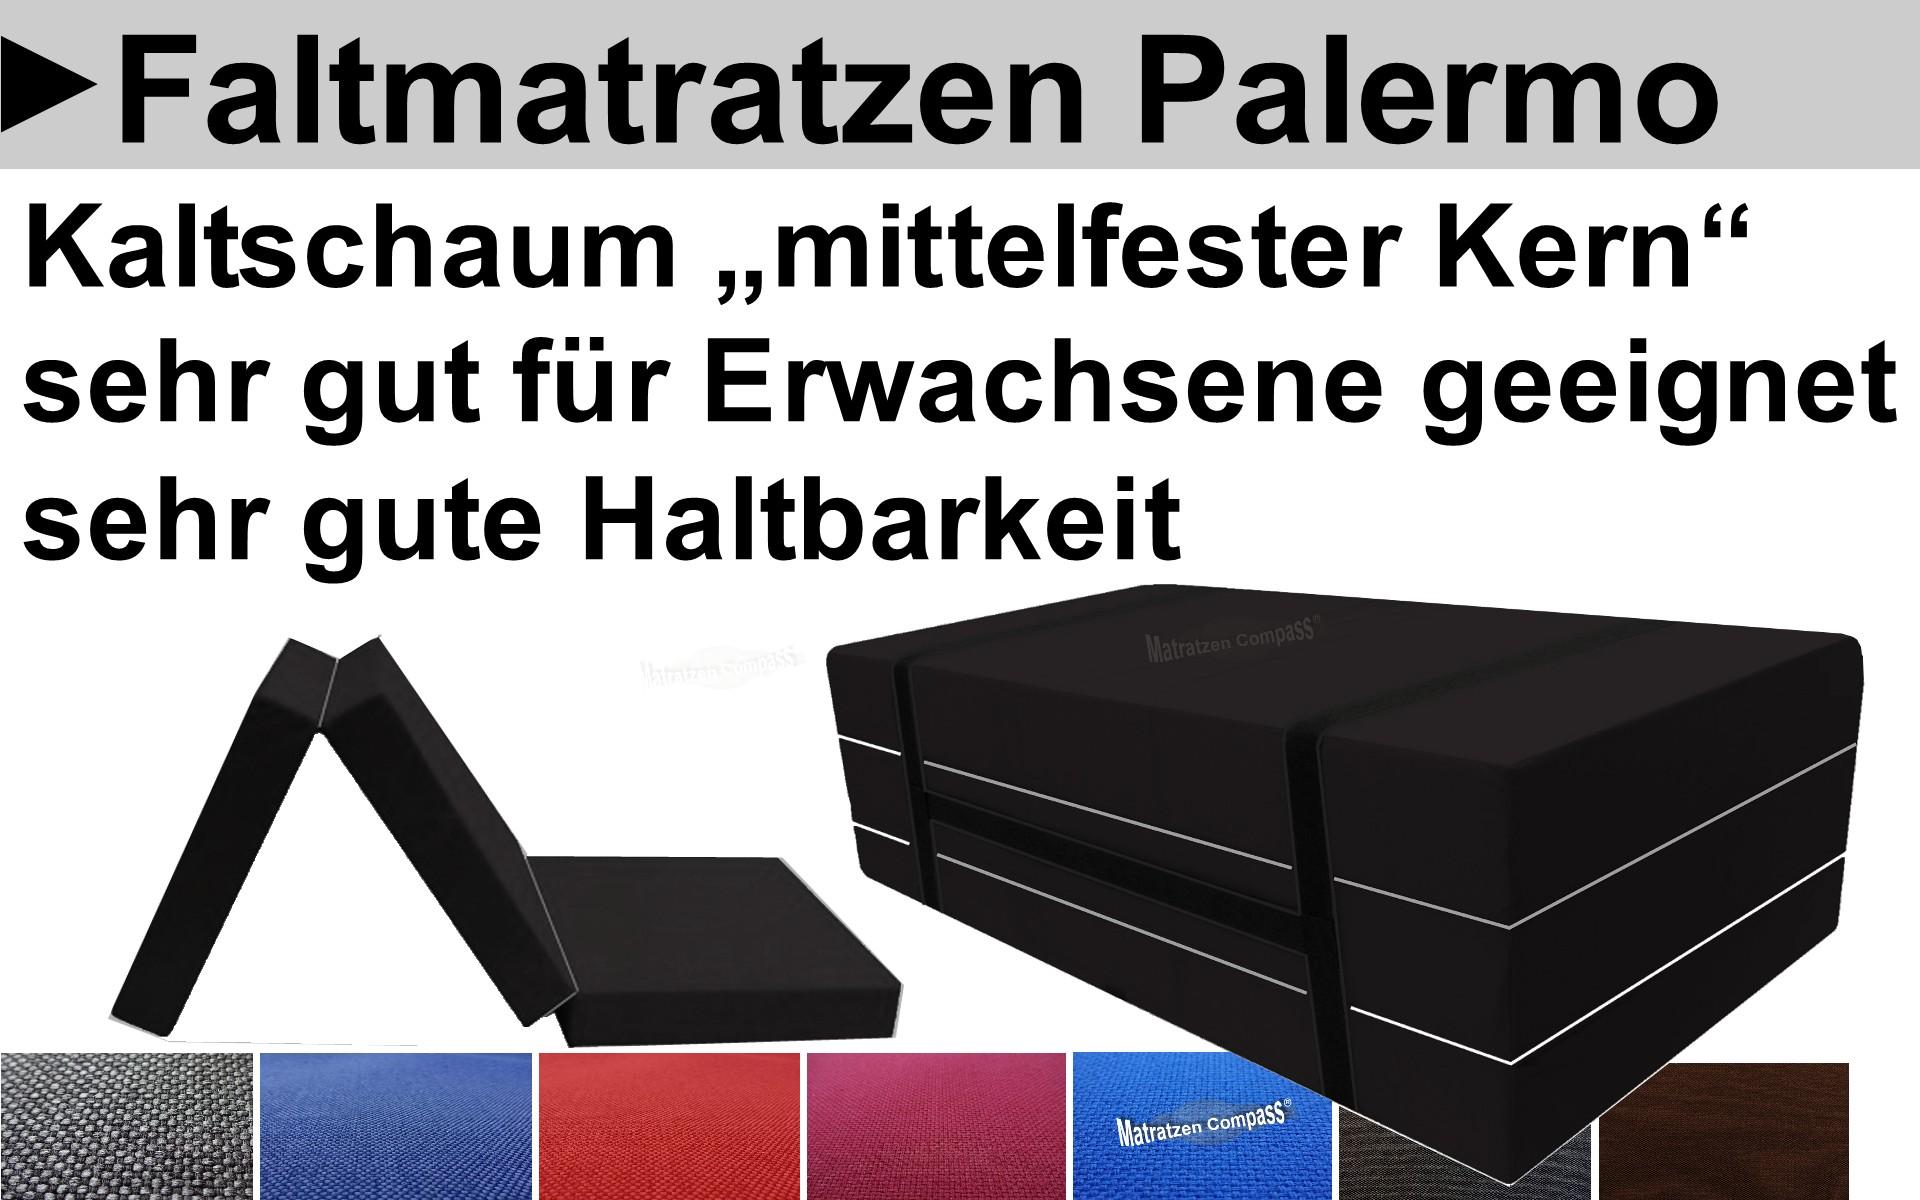 Faltmatratze-Faltmatratzen-Falt-Matratze-faltbare-Matratze-faltbare-Matratzen-gute-Faltmatatze-getestete-Faltmatratze-beste-FaltmatratzeeZYMSklZ5R6HD